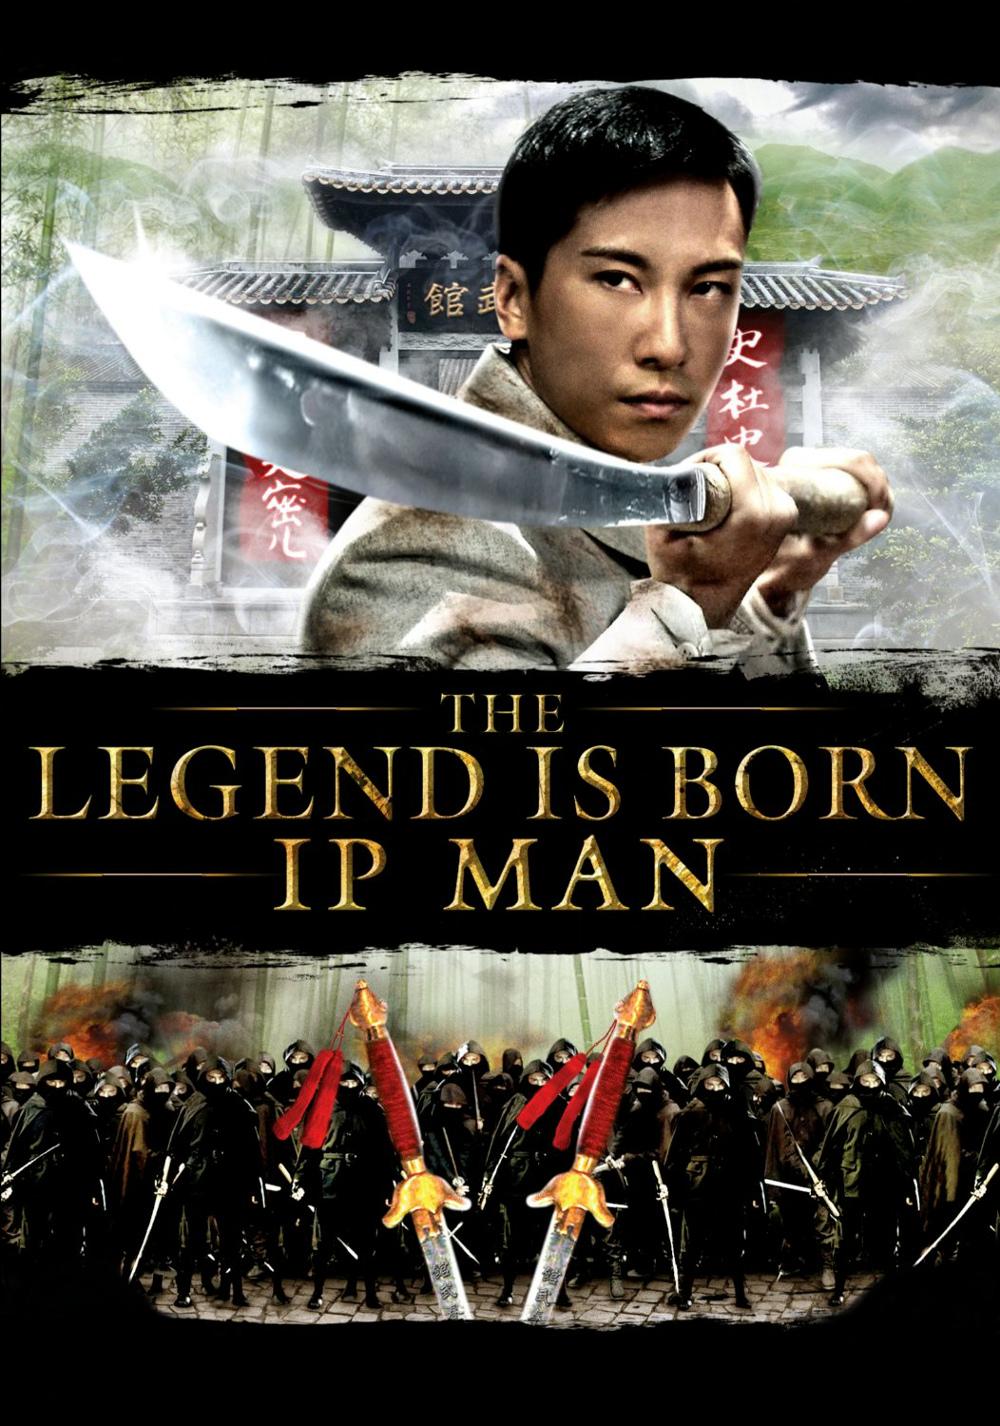 ip man 4 full movie download